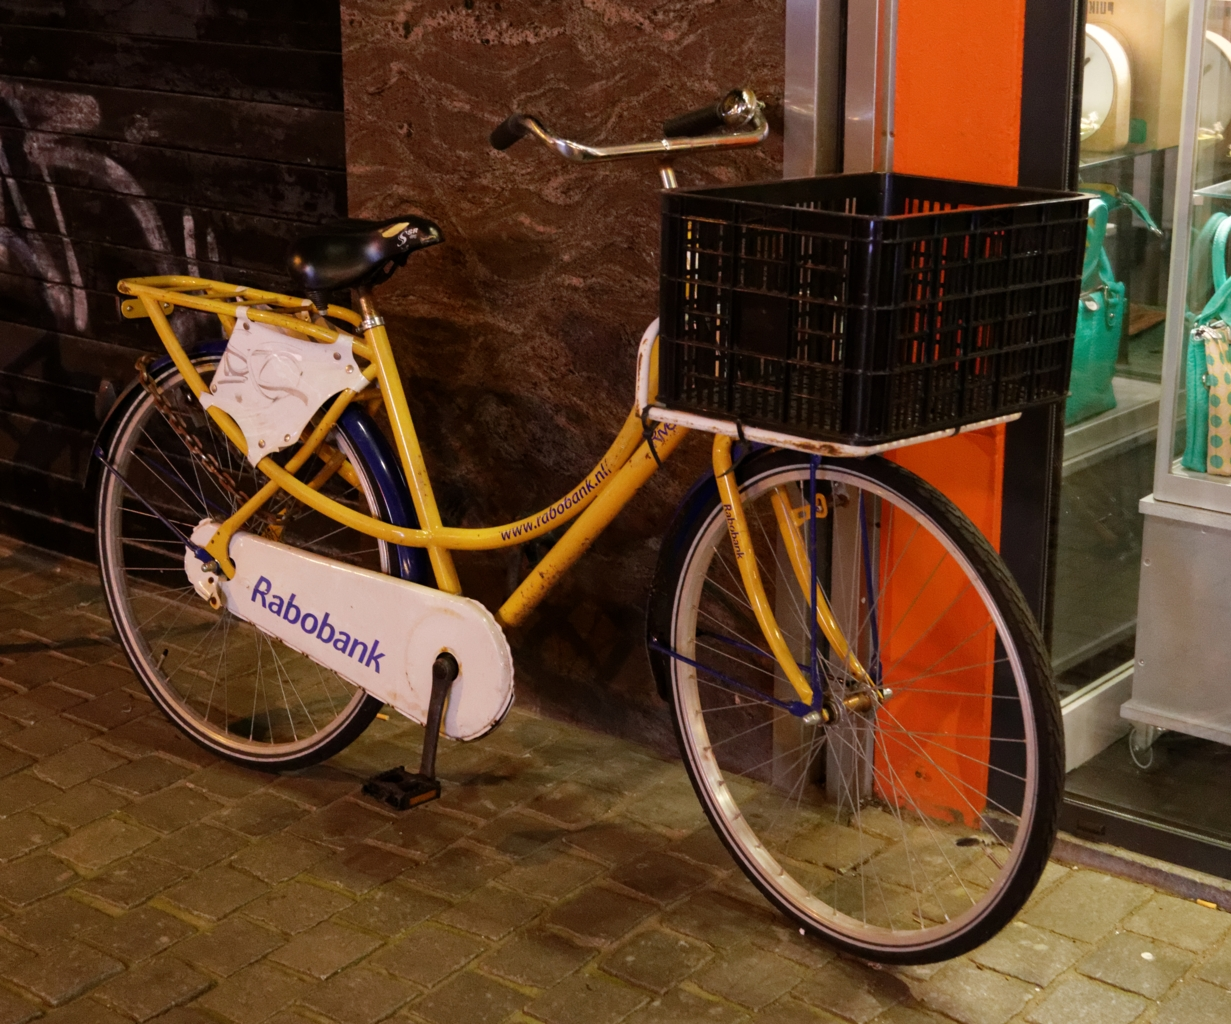 Rabobank sykkel